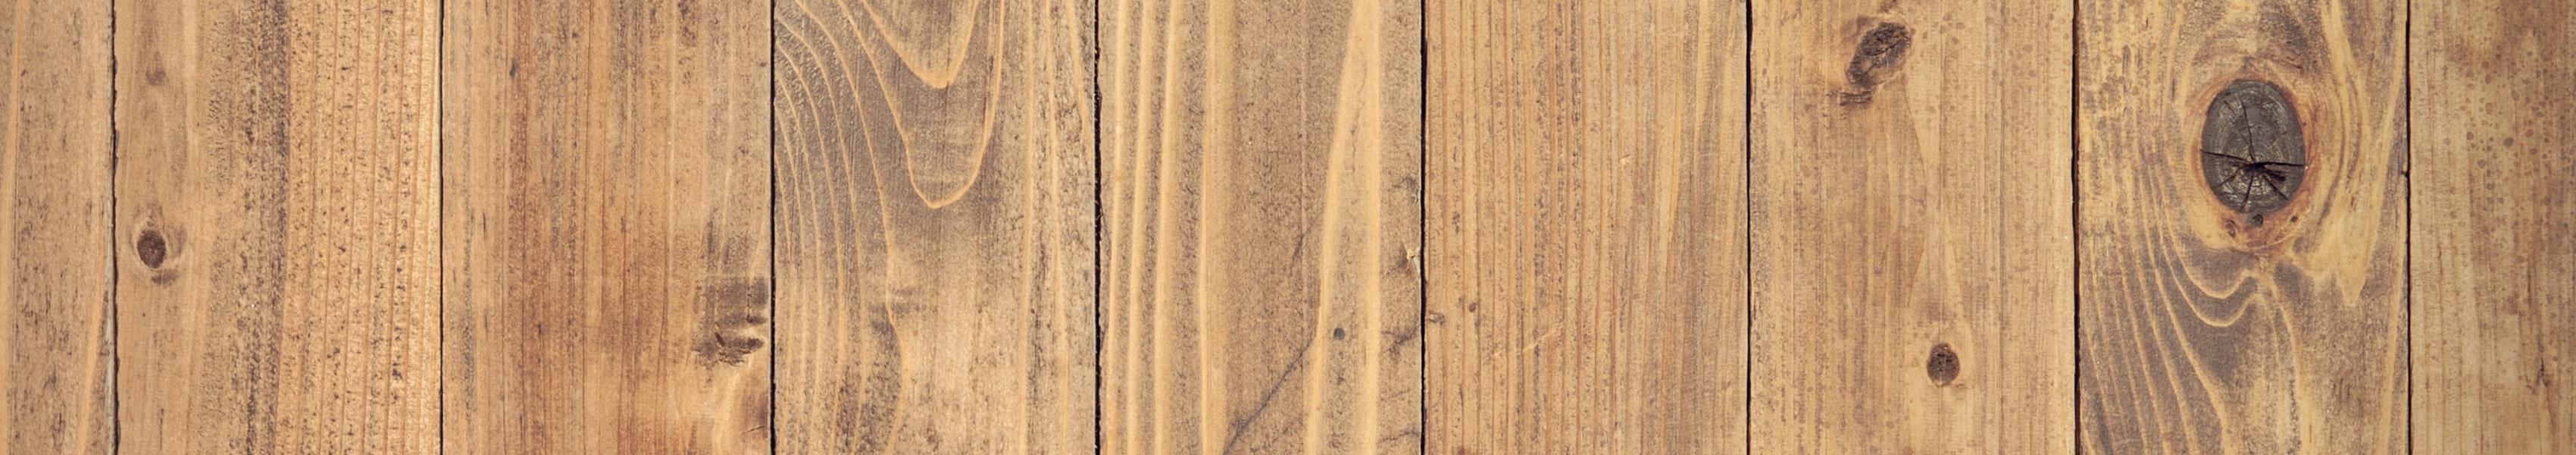 75mm X 35mm (3 X 1.5) Timber